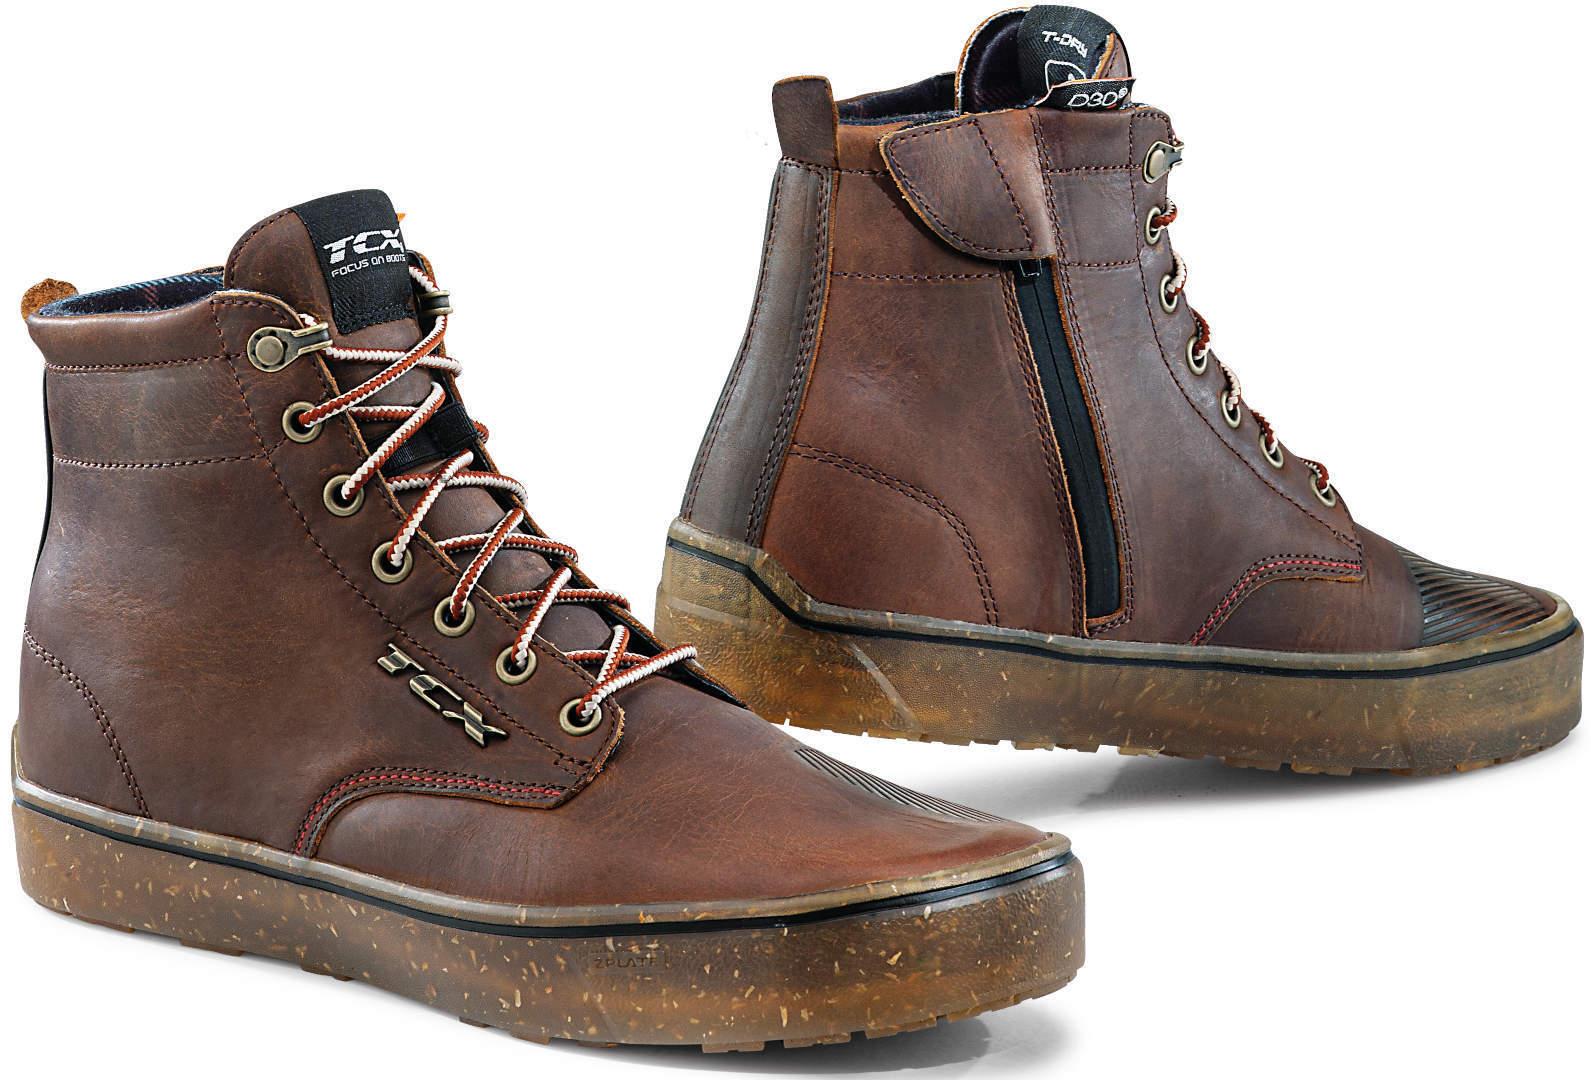 TCX Dartwood Waterproof Motorcycle Shoes Chaussures de moto imperméables Brun taille : 39